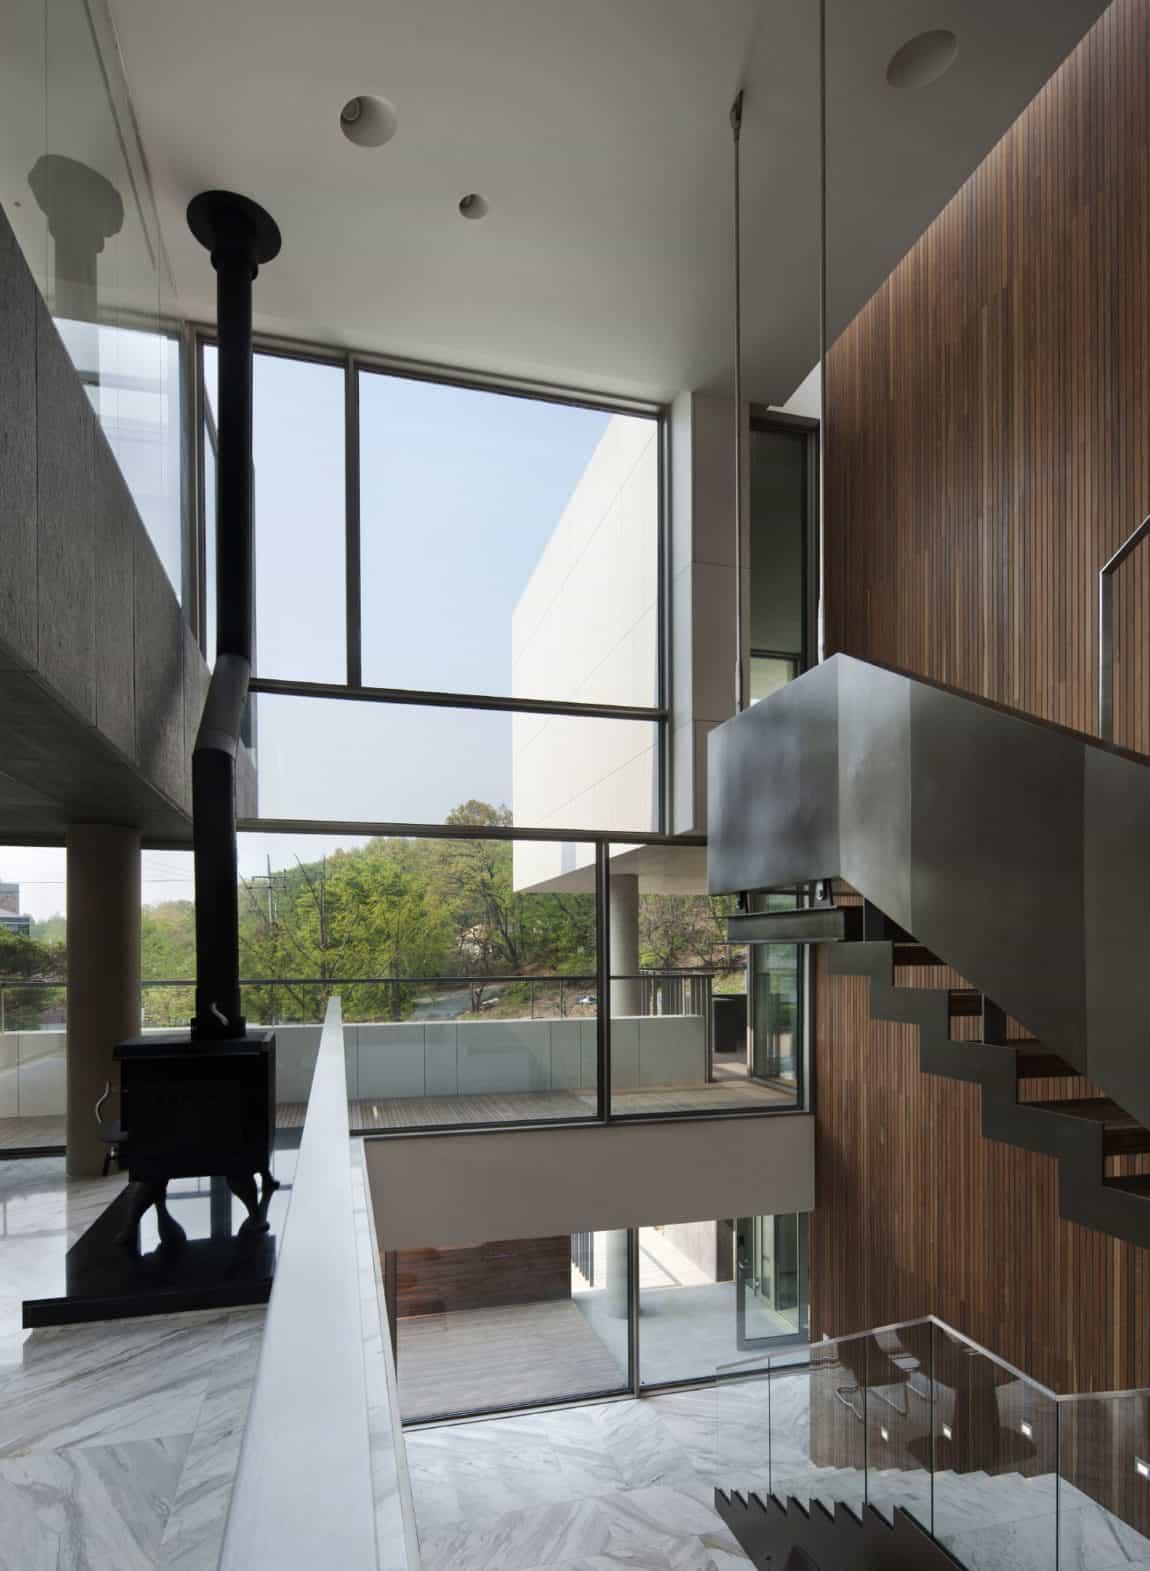 Customi-Zip by L'EAU Design (5)